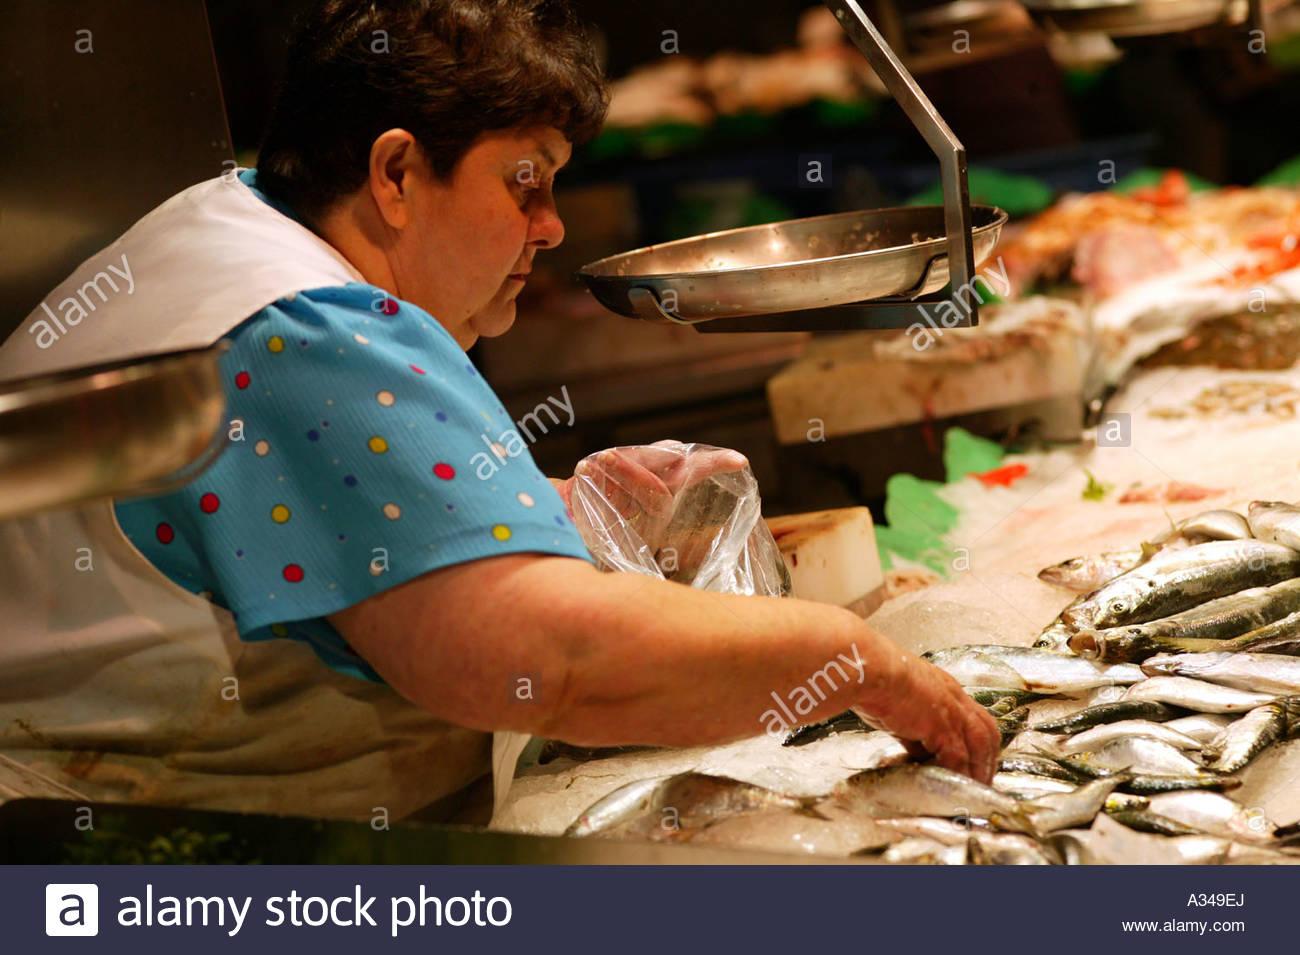 Woman working at a fish stall at Barcelona's famous indoor food market La Boqueria off La Rambla central Barcelona - Stock Image